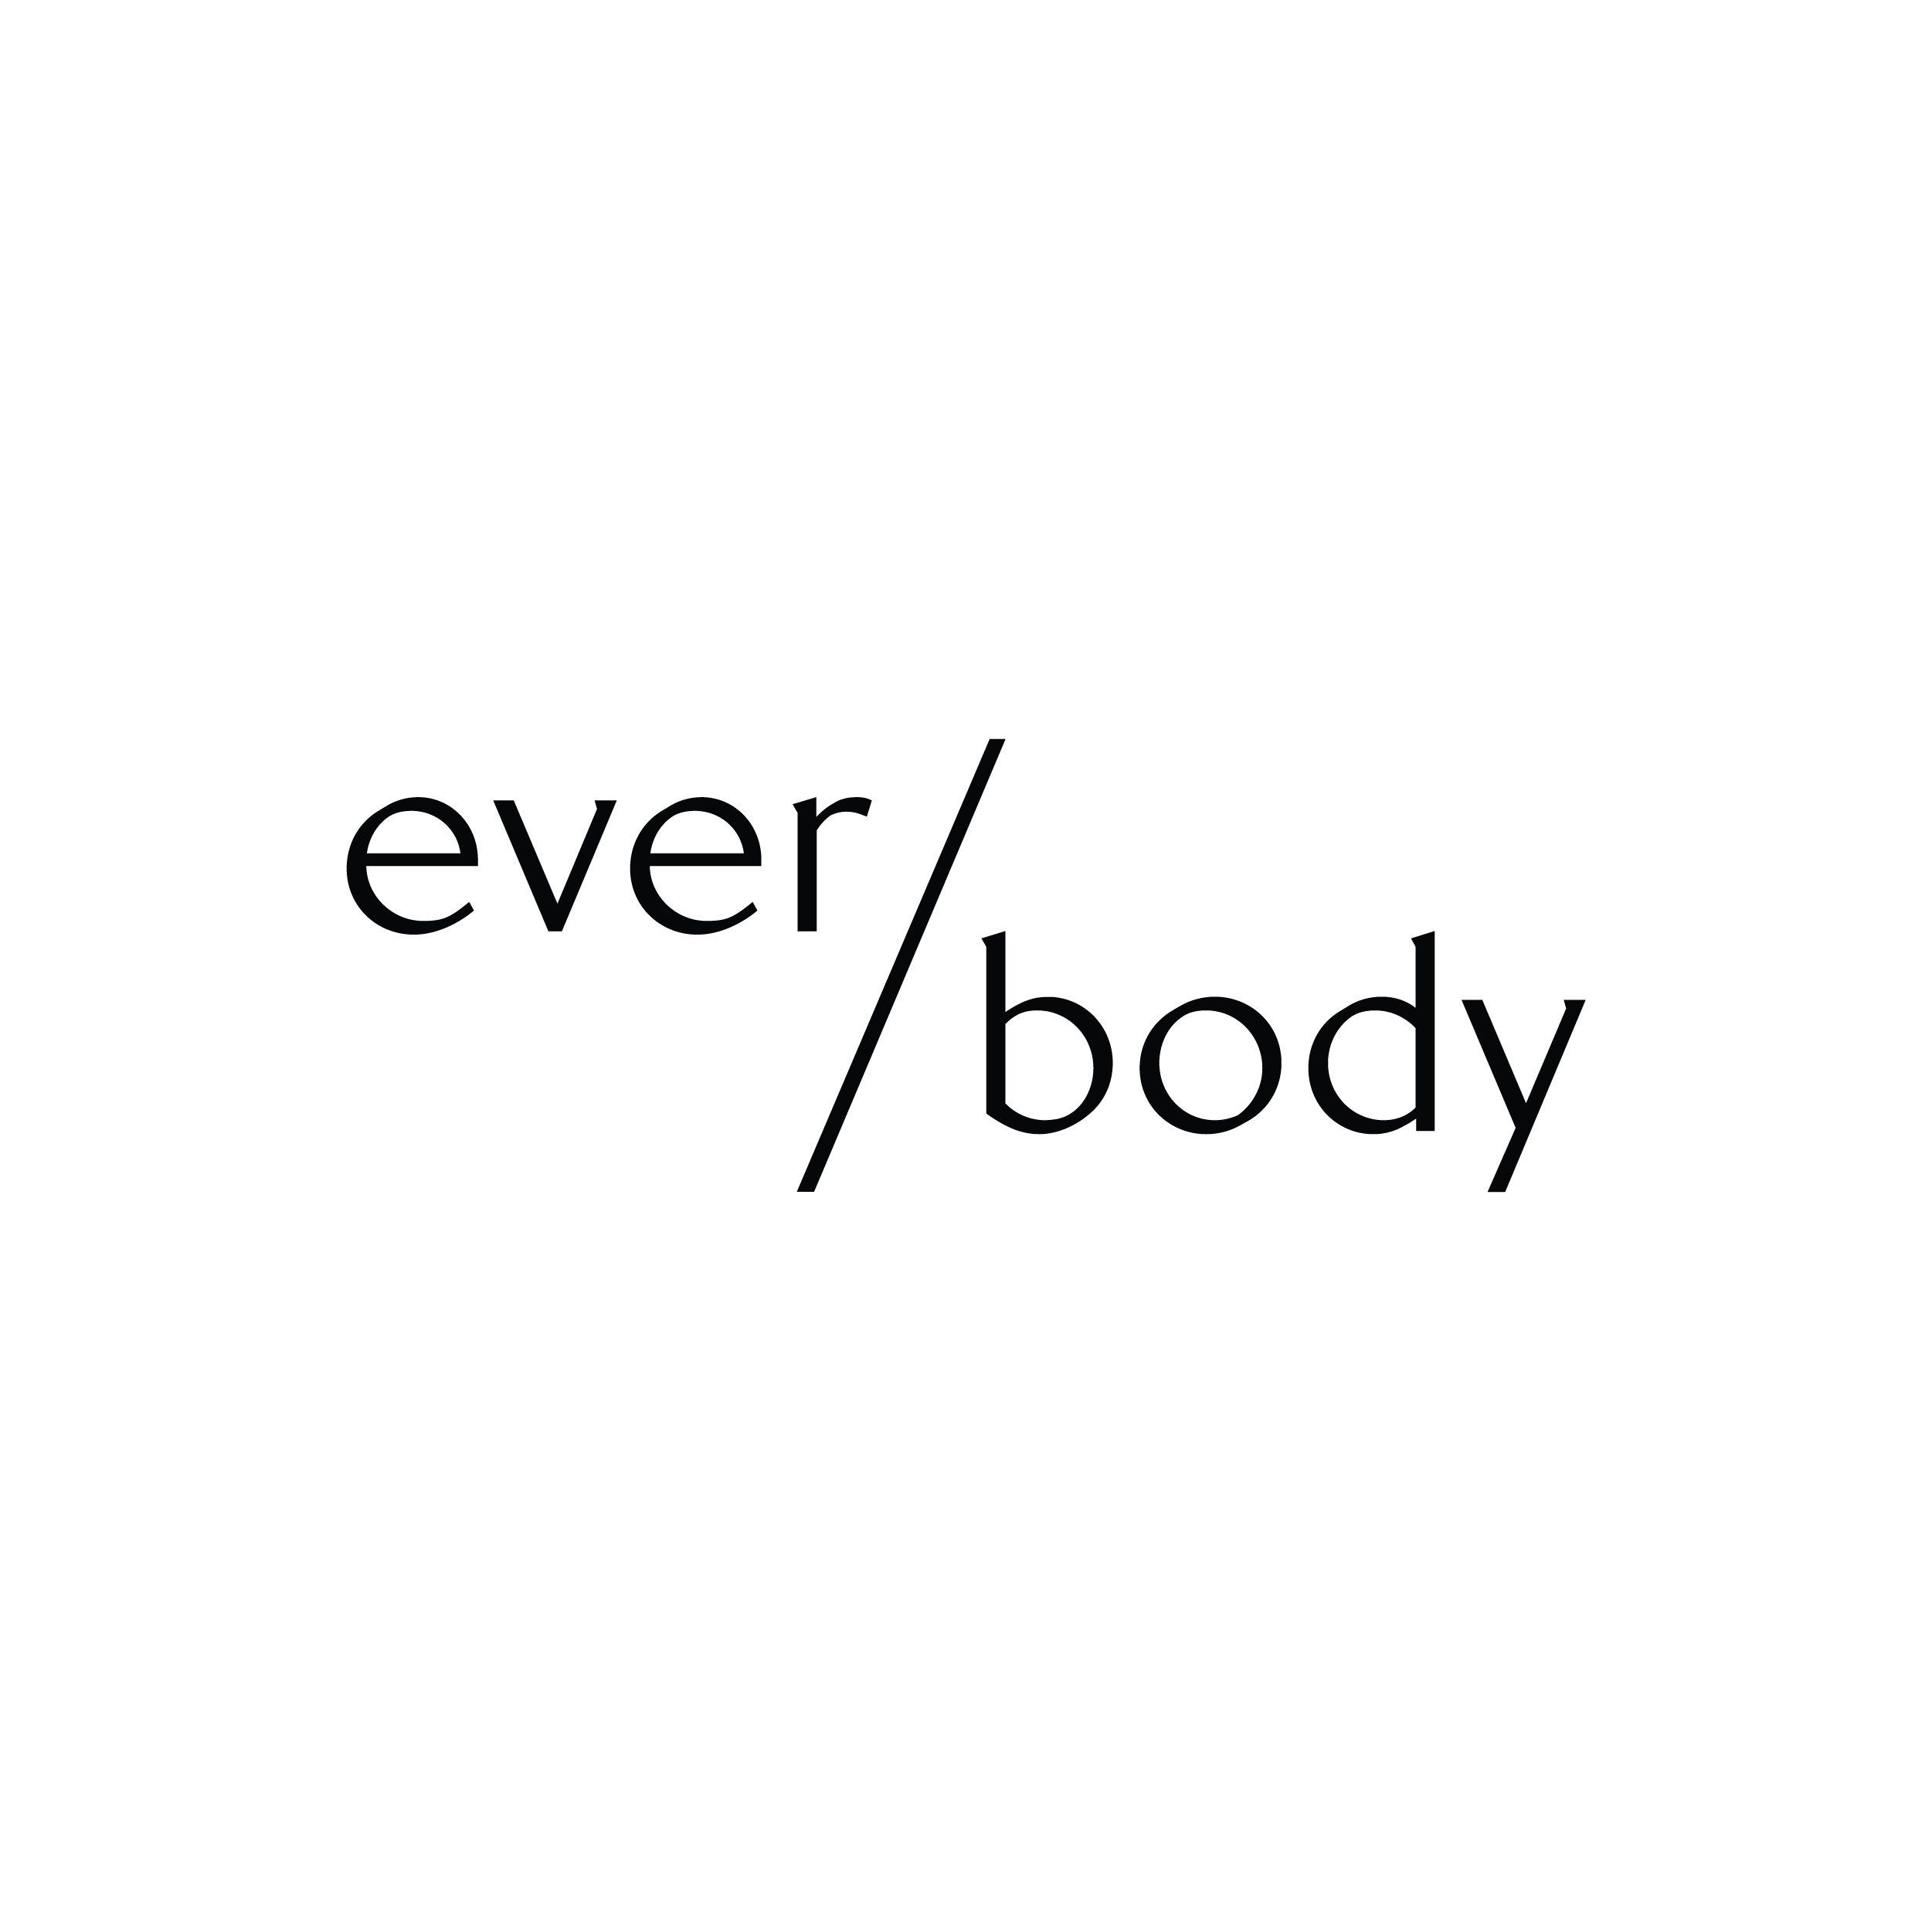 Ever/body